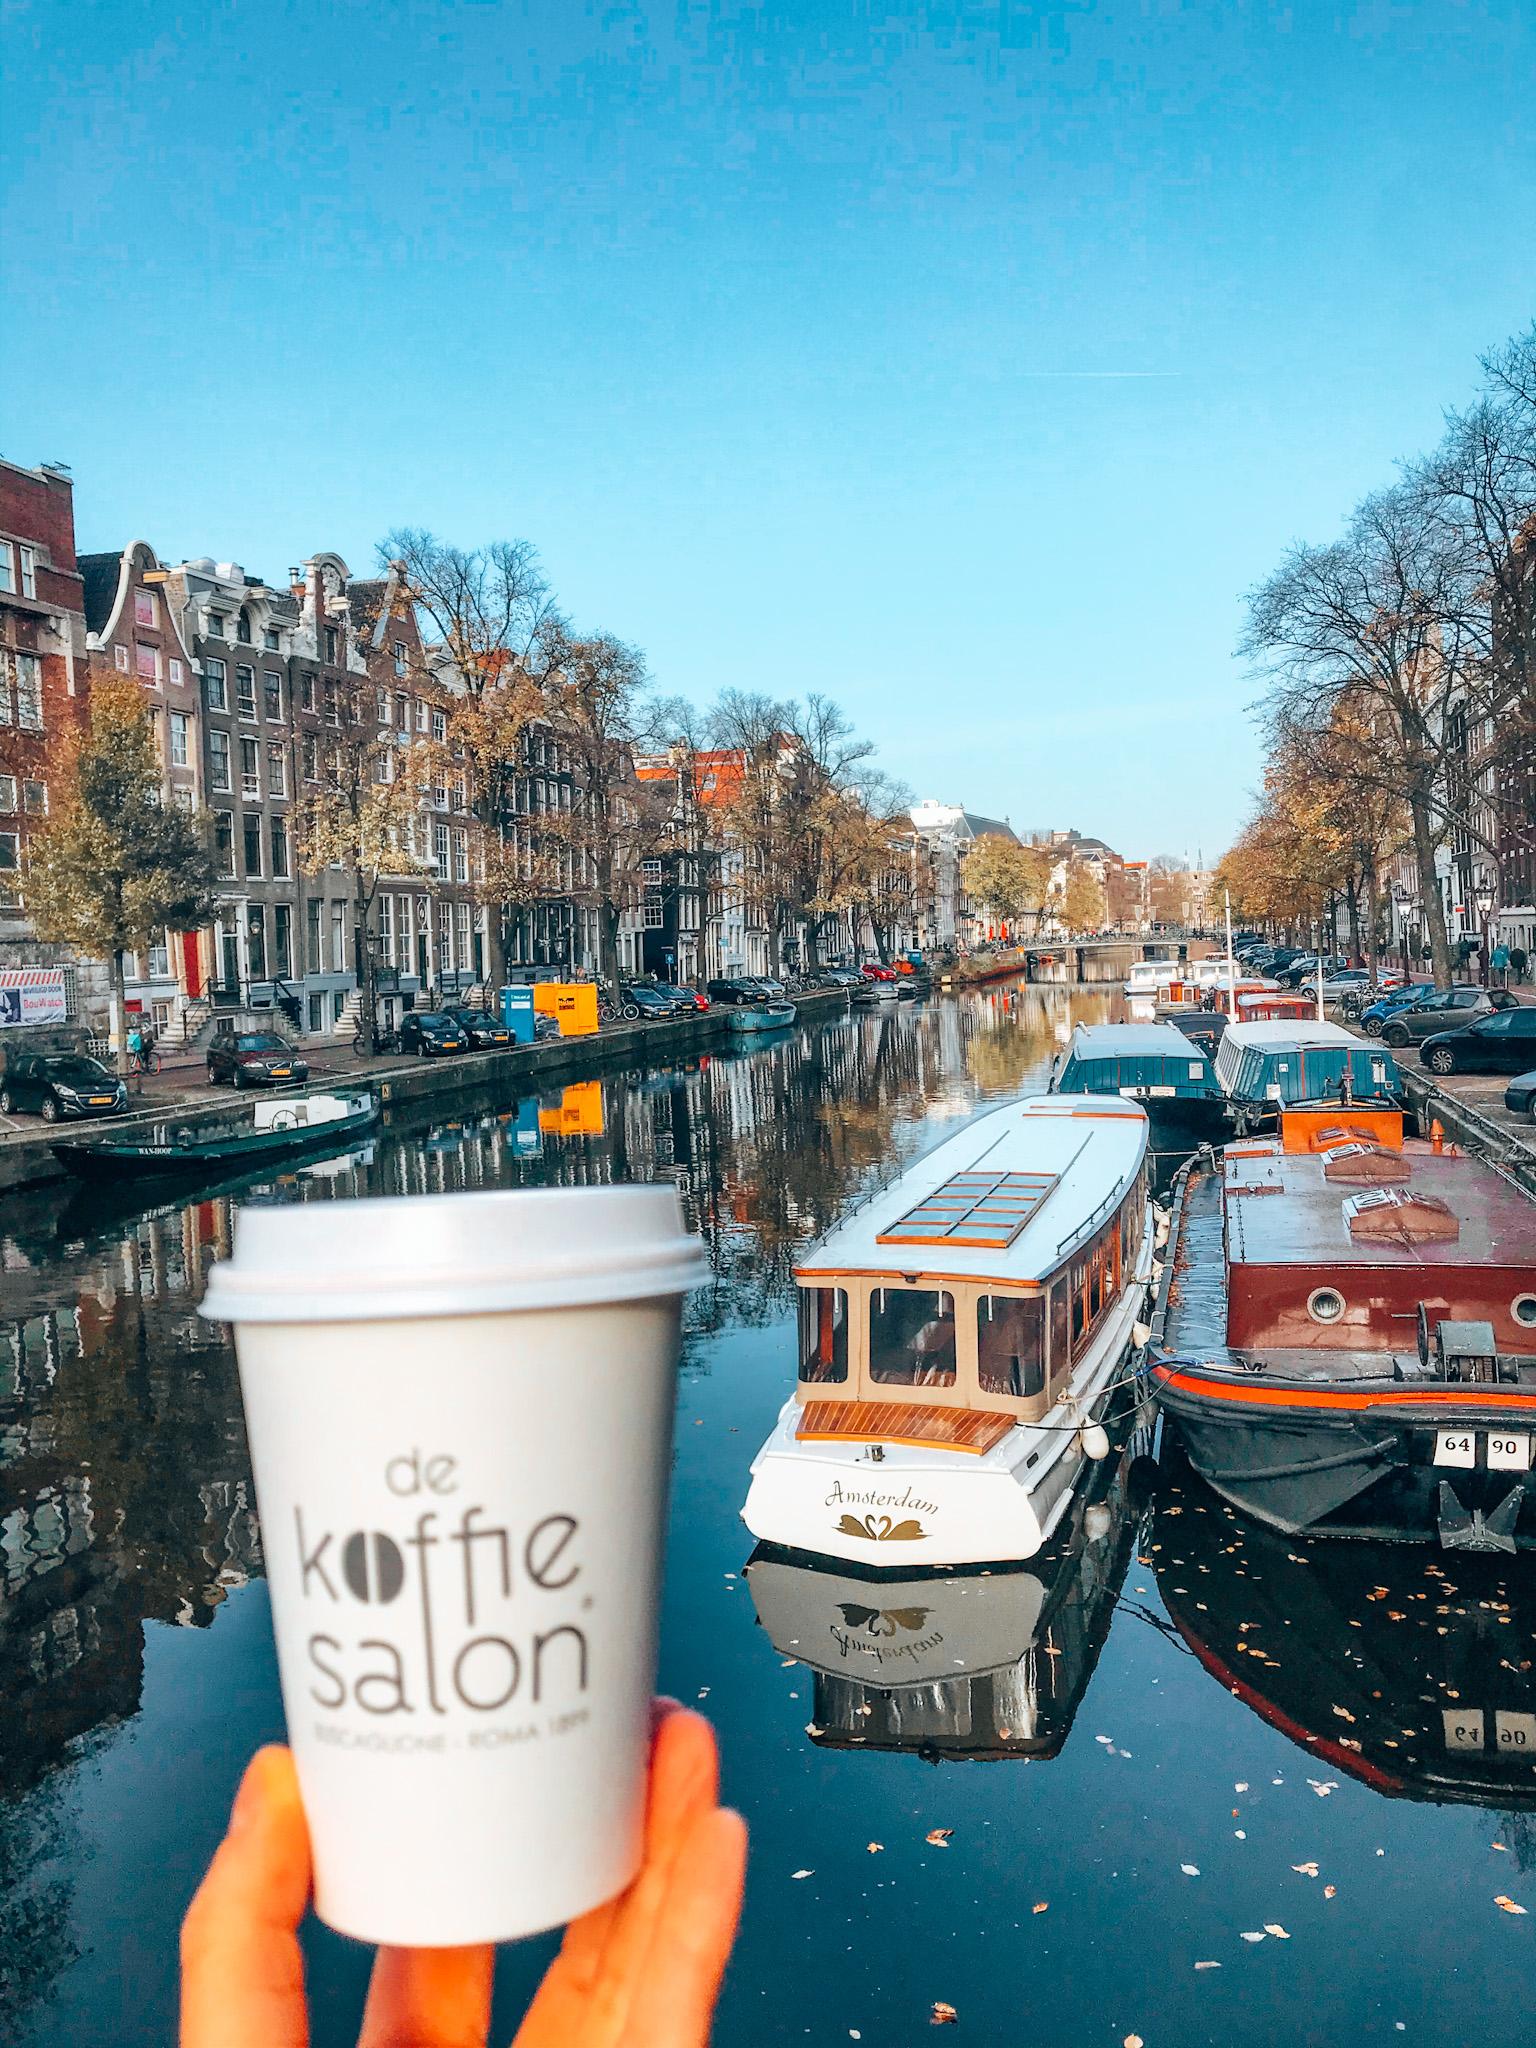 De Koffie Salon Amsterdam